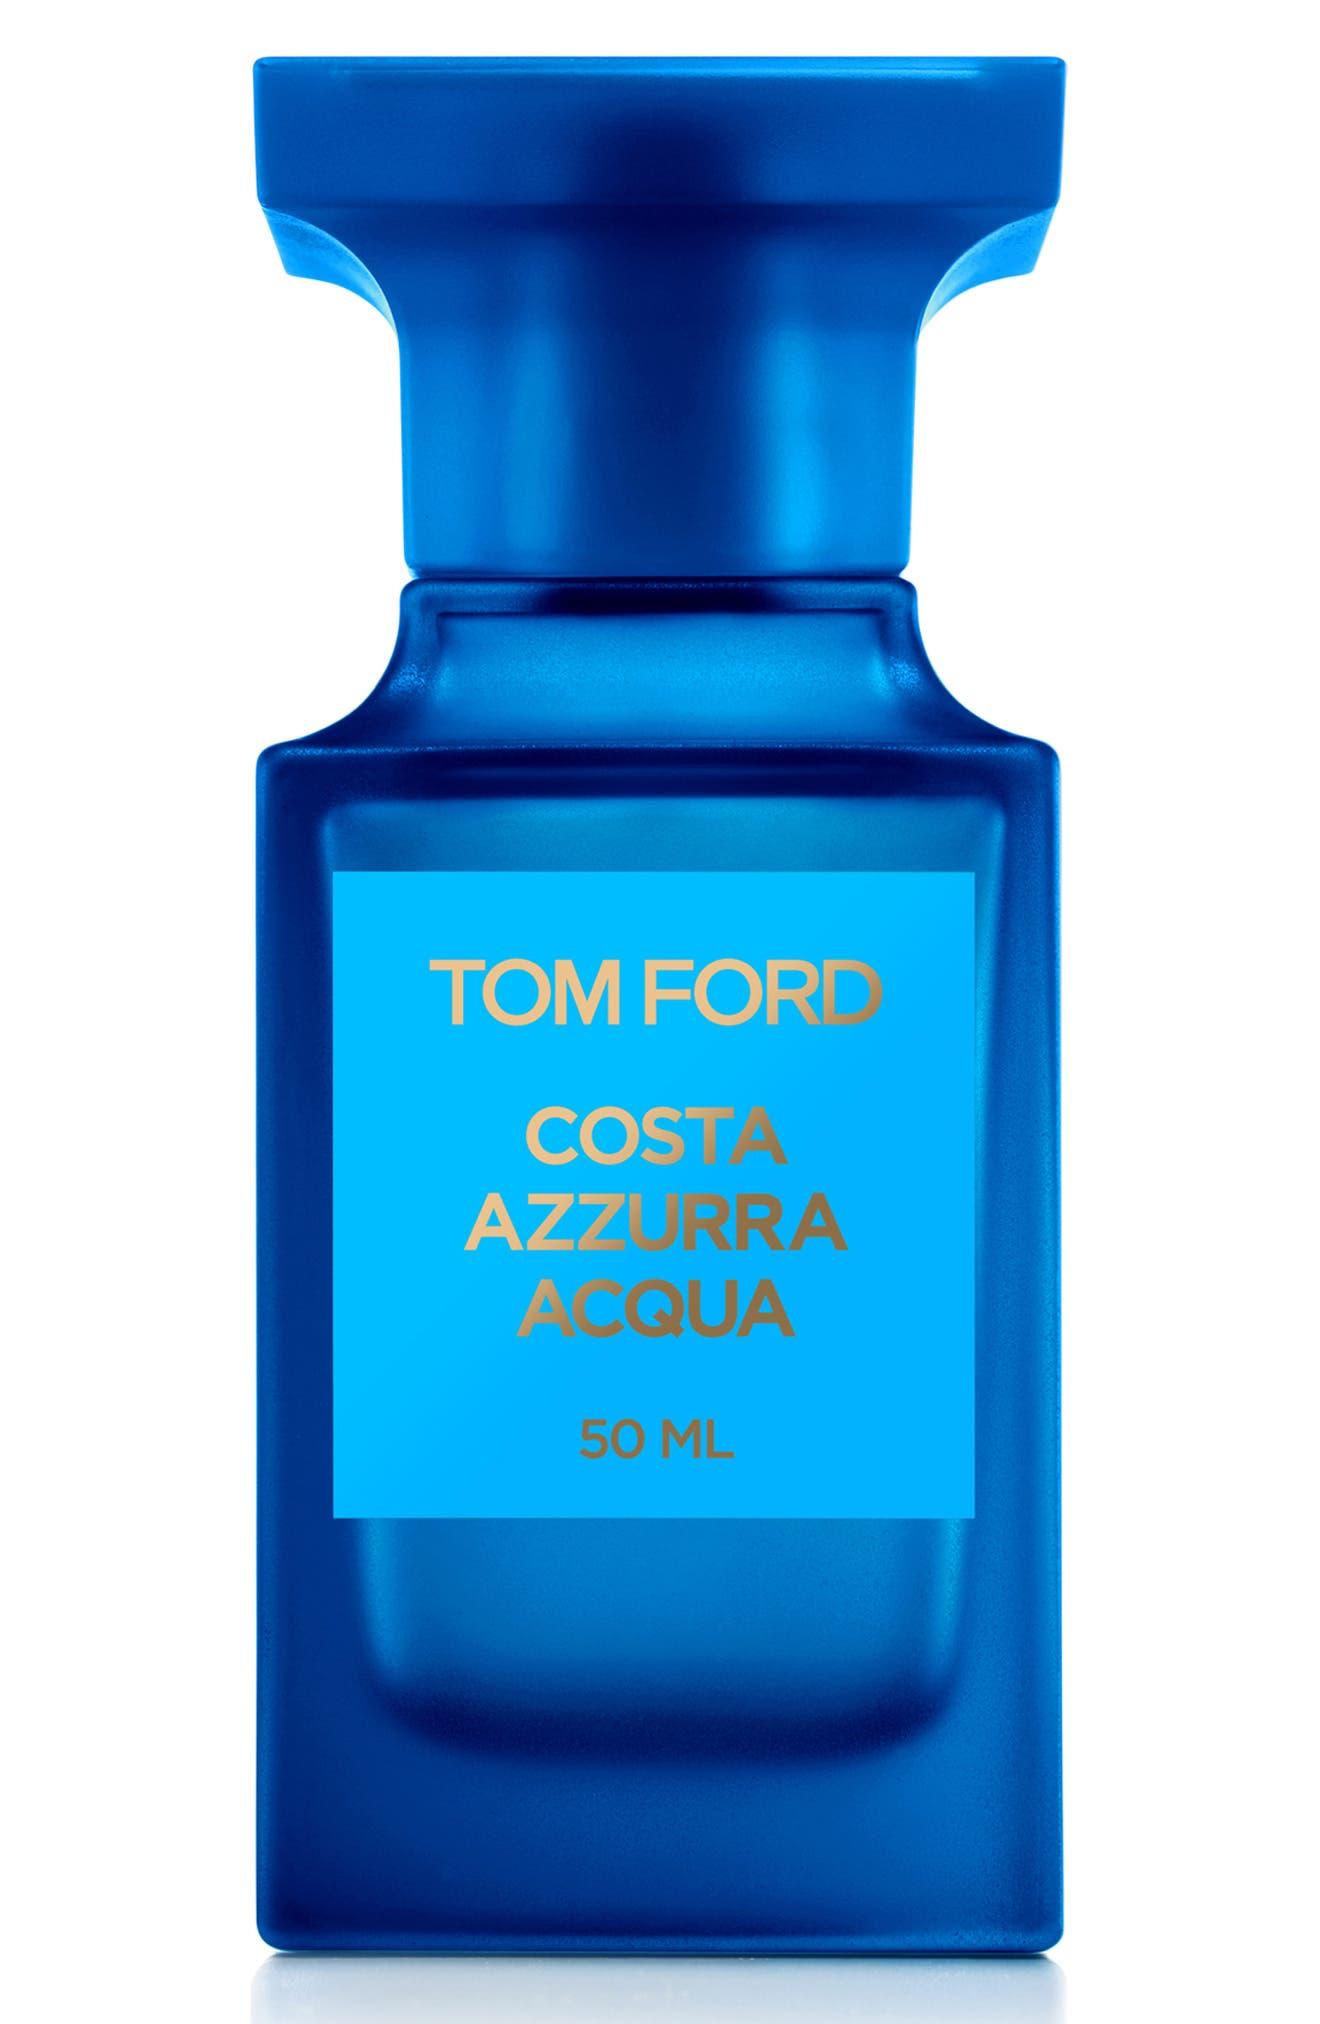 Tom Ford Costa Azzurra Acqua Fragrance